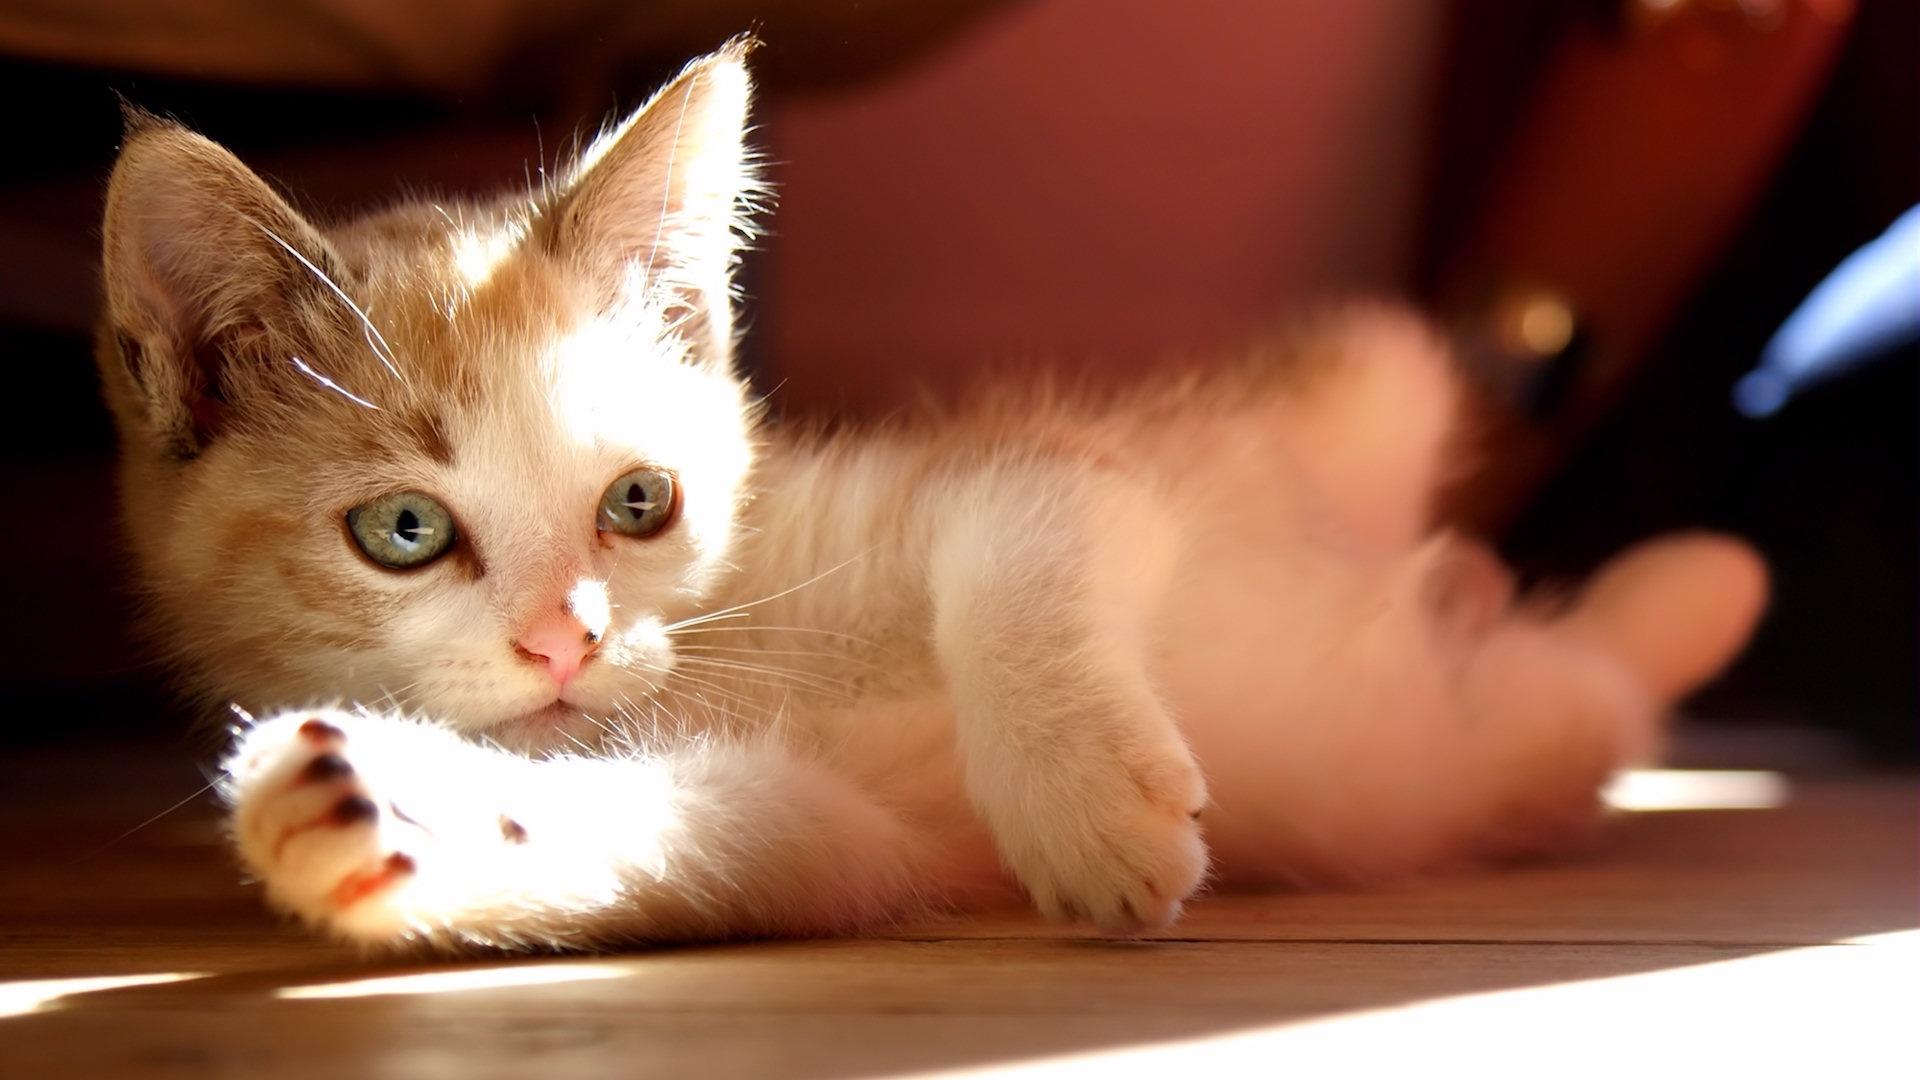 Cute Kitten Wallpaper Desktop Cat 1920 1080jpg 1920x1080